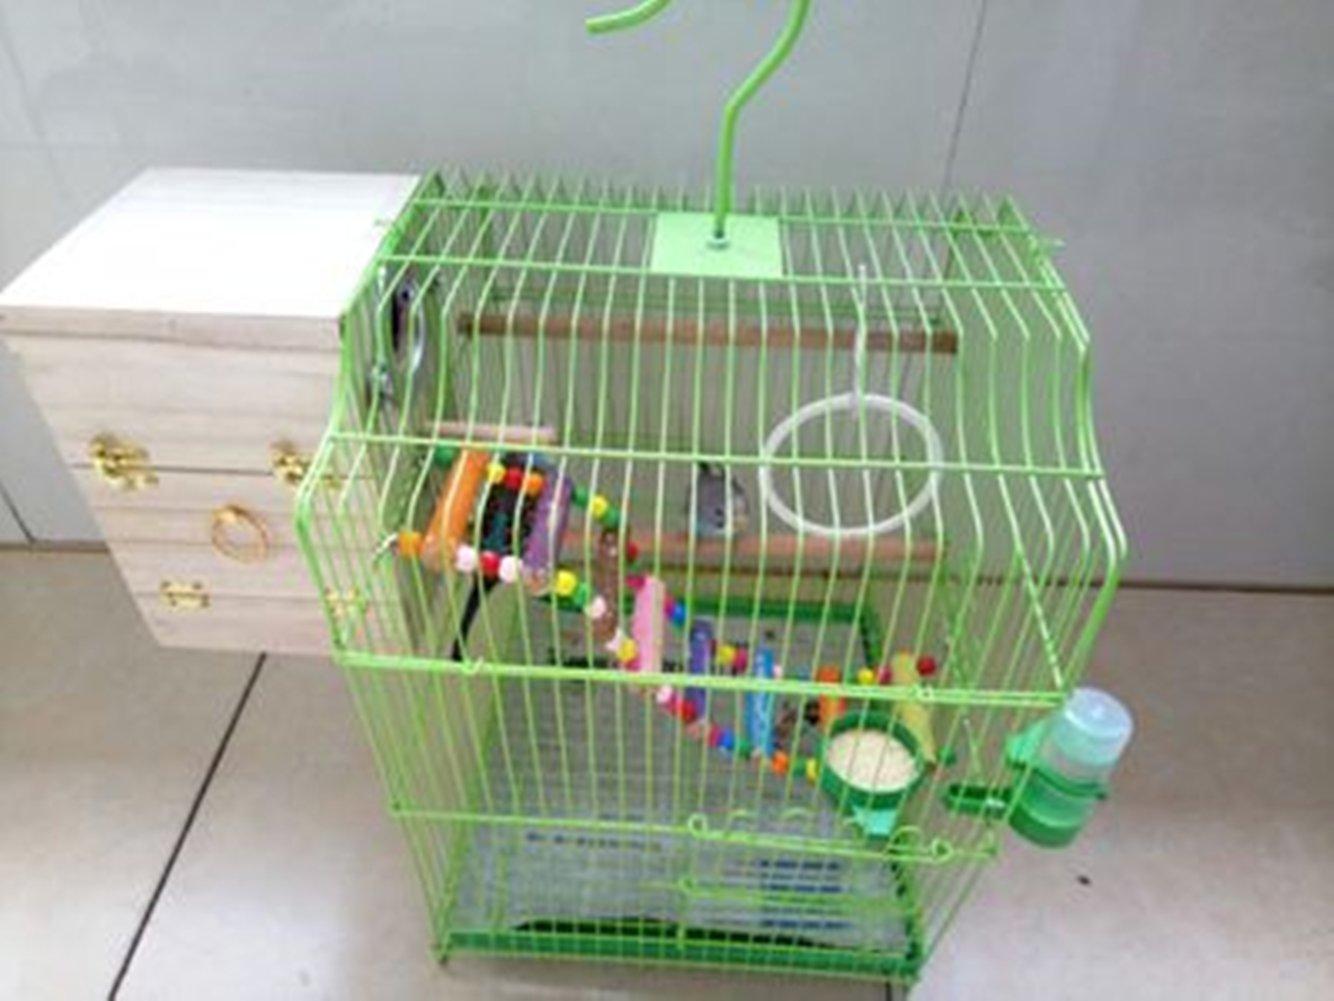 YJJKJ Pet Bird Wood Breeding Box Parakeet Budgie Cockatiel Breeding Nesting Bird Aviary Cage Box